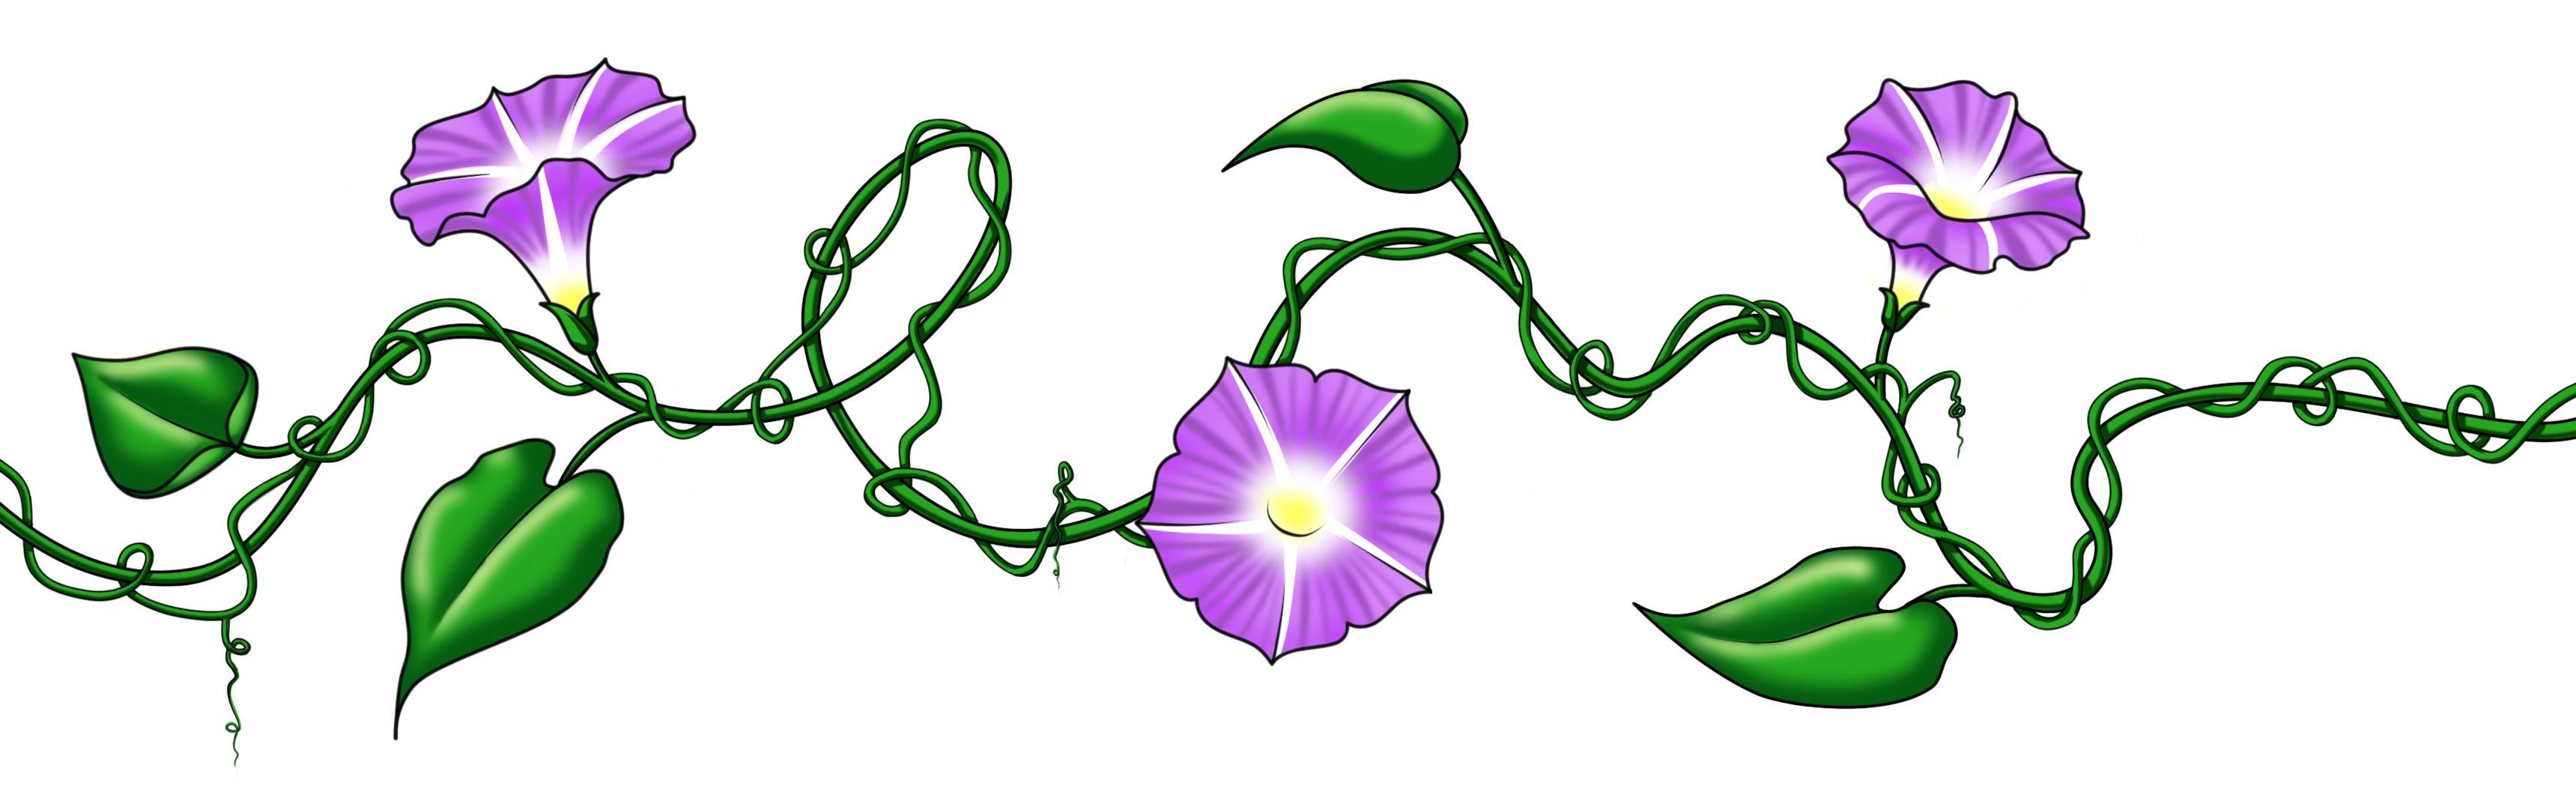 Morning Glory Flower Tattoo Designs